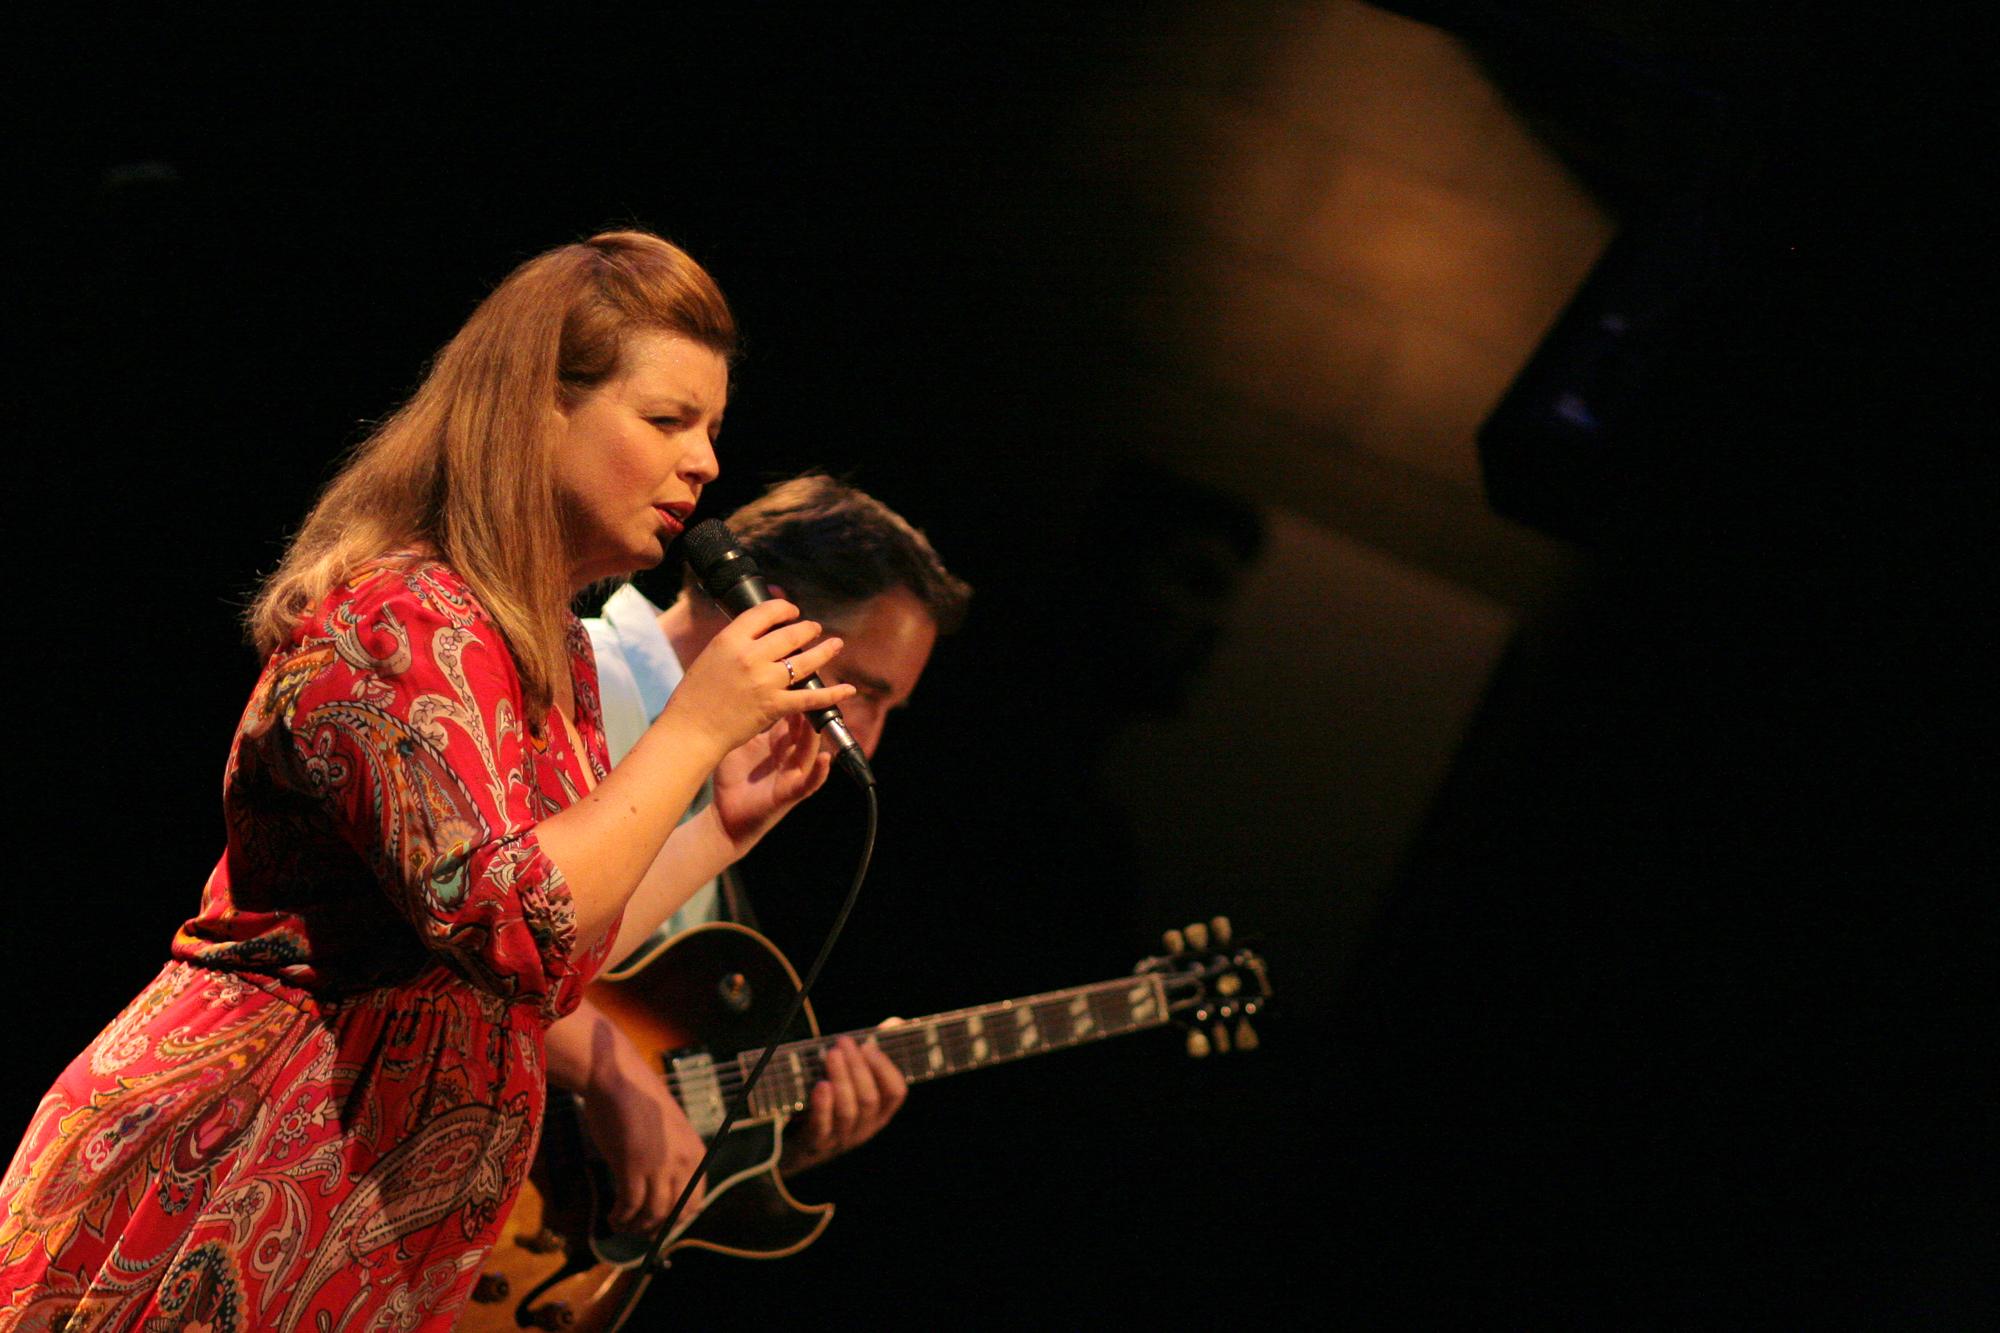 Simone Kopmajer @ Theater am Spittelberg Wien, 30.08.2020 (c) miggl.at